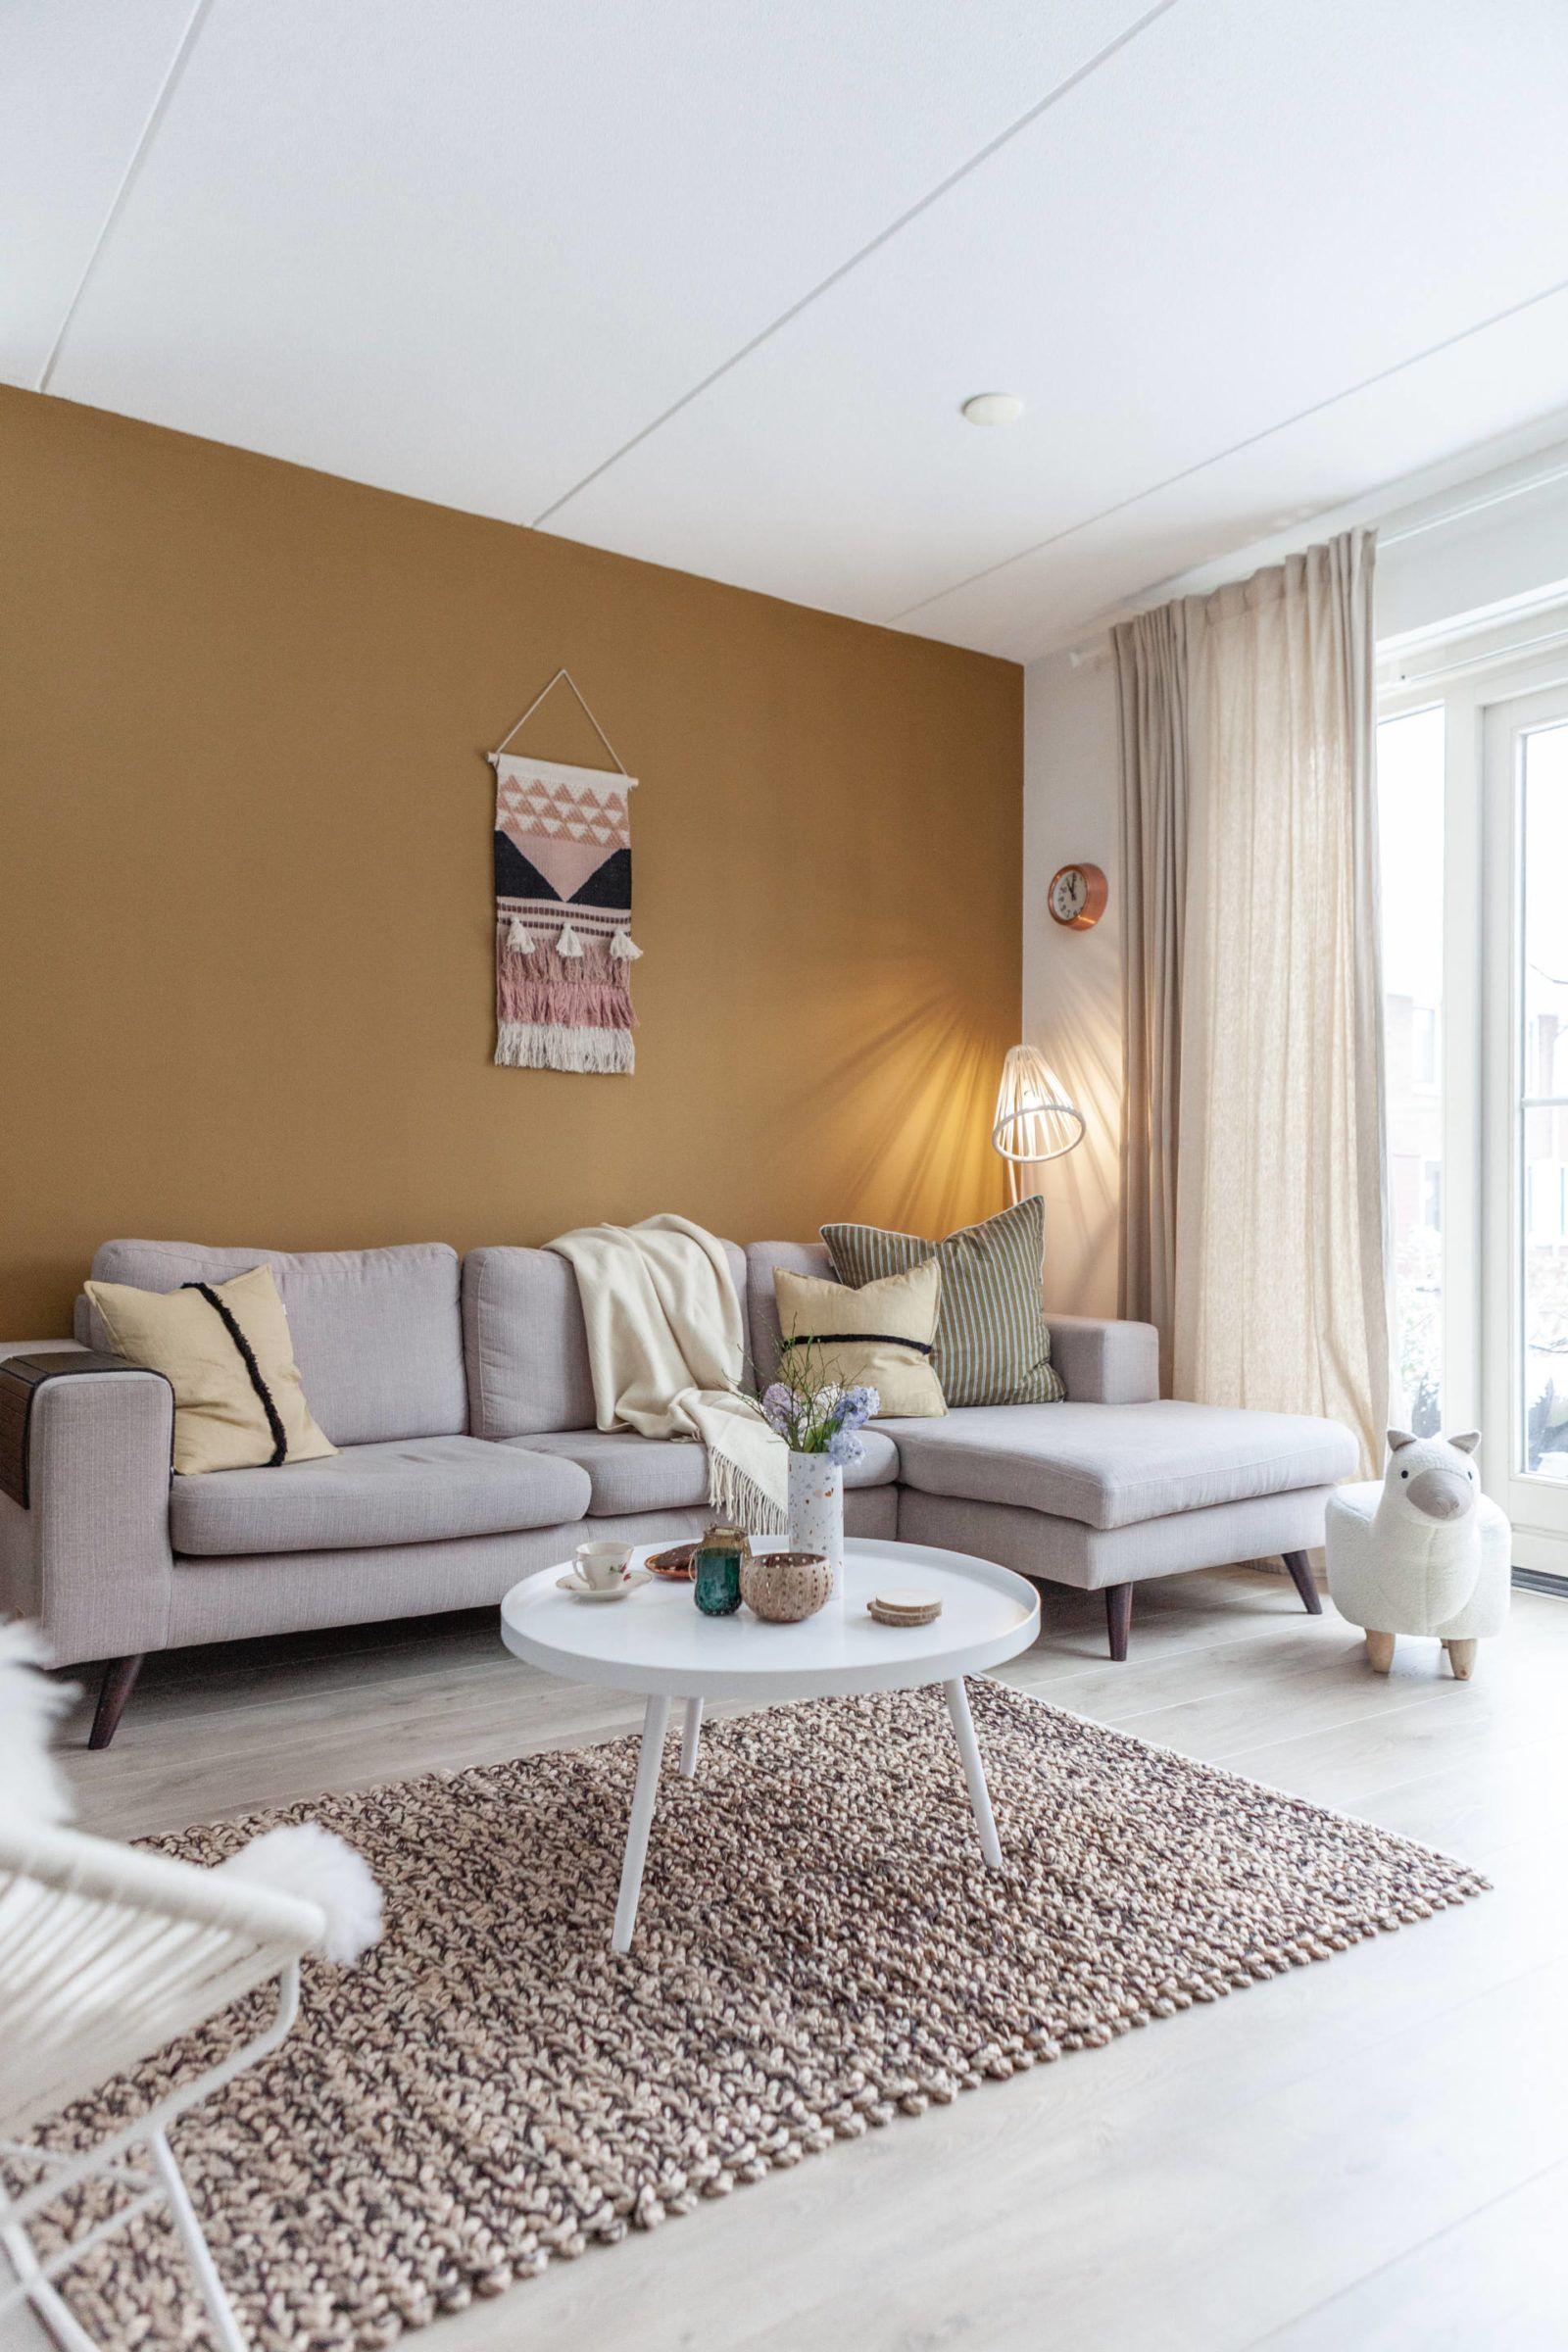 Woonkamer make-over nieuwbouwhuis in Almere - Juudithhome- interieur & styling #woonkamerideeen